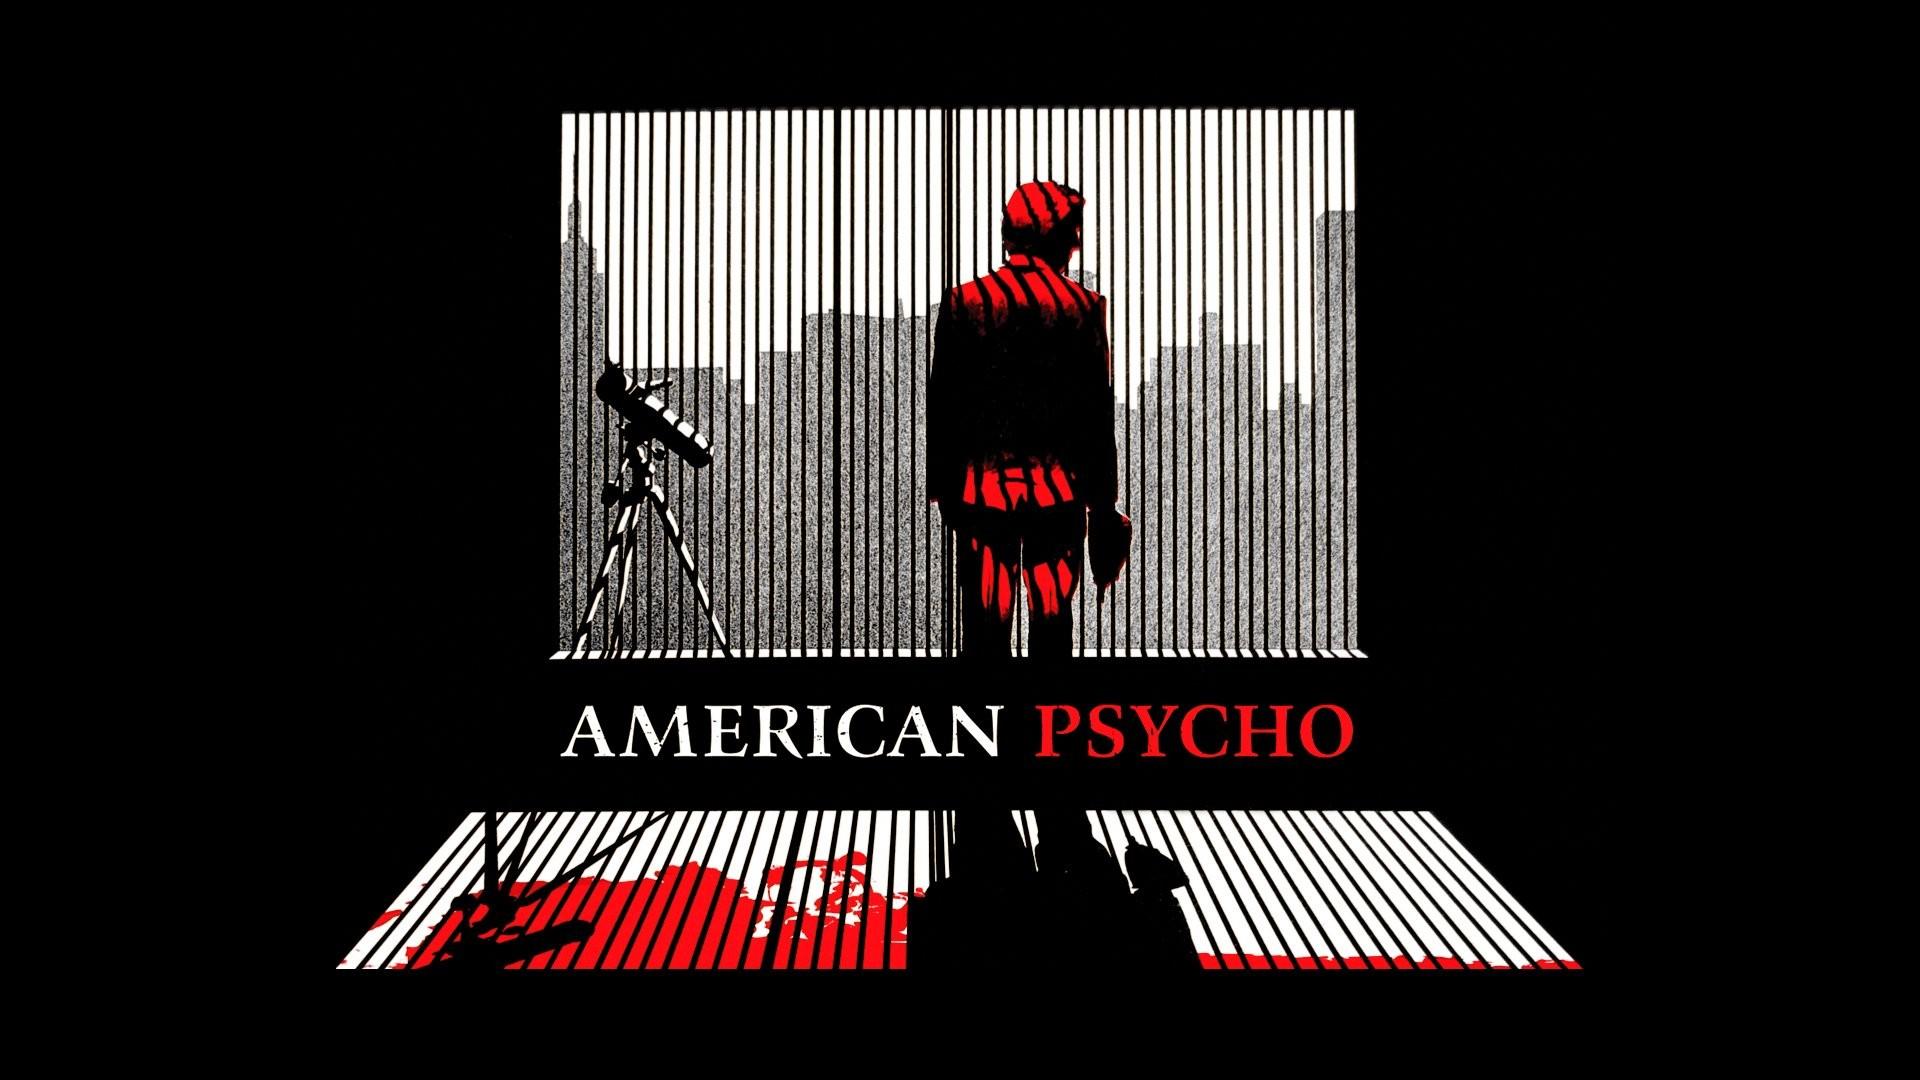 1920x1080 px American Psycho phim